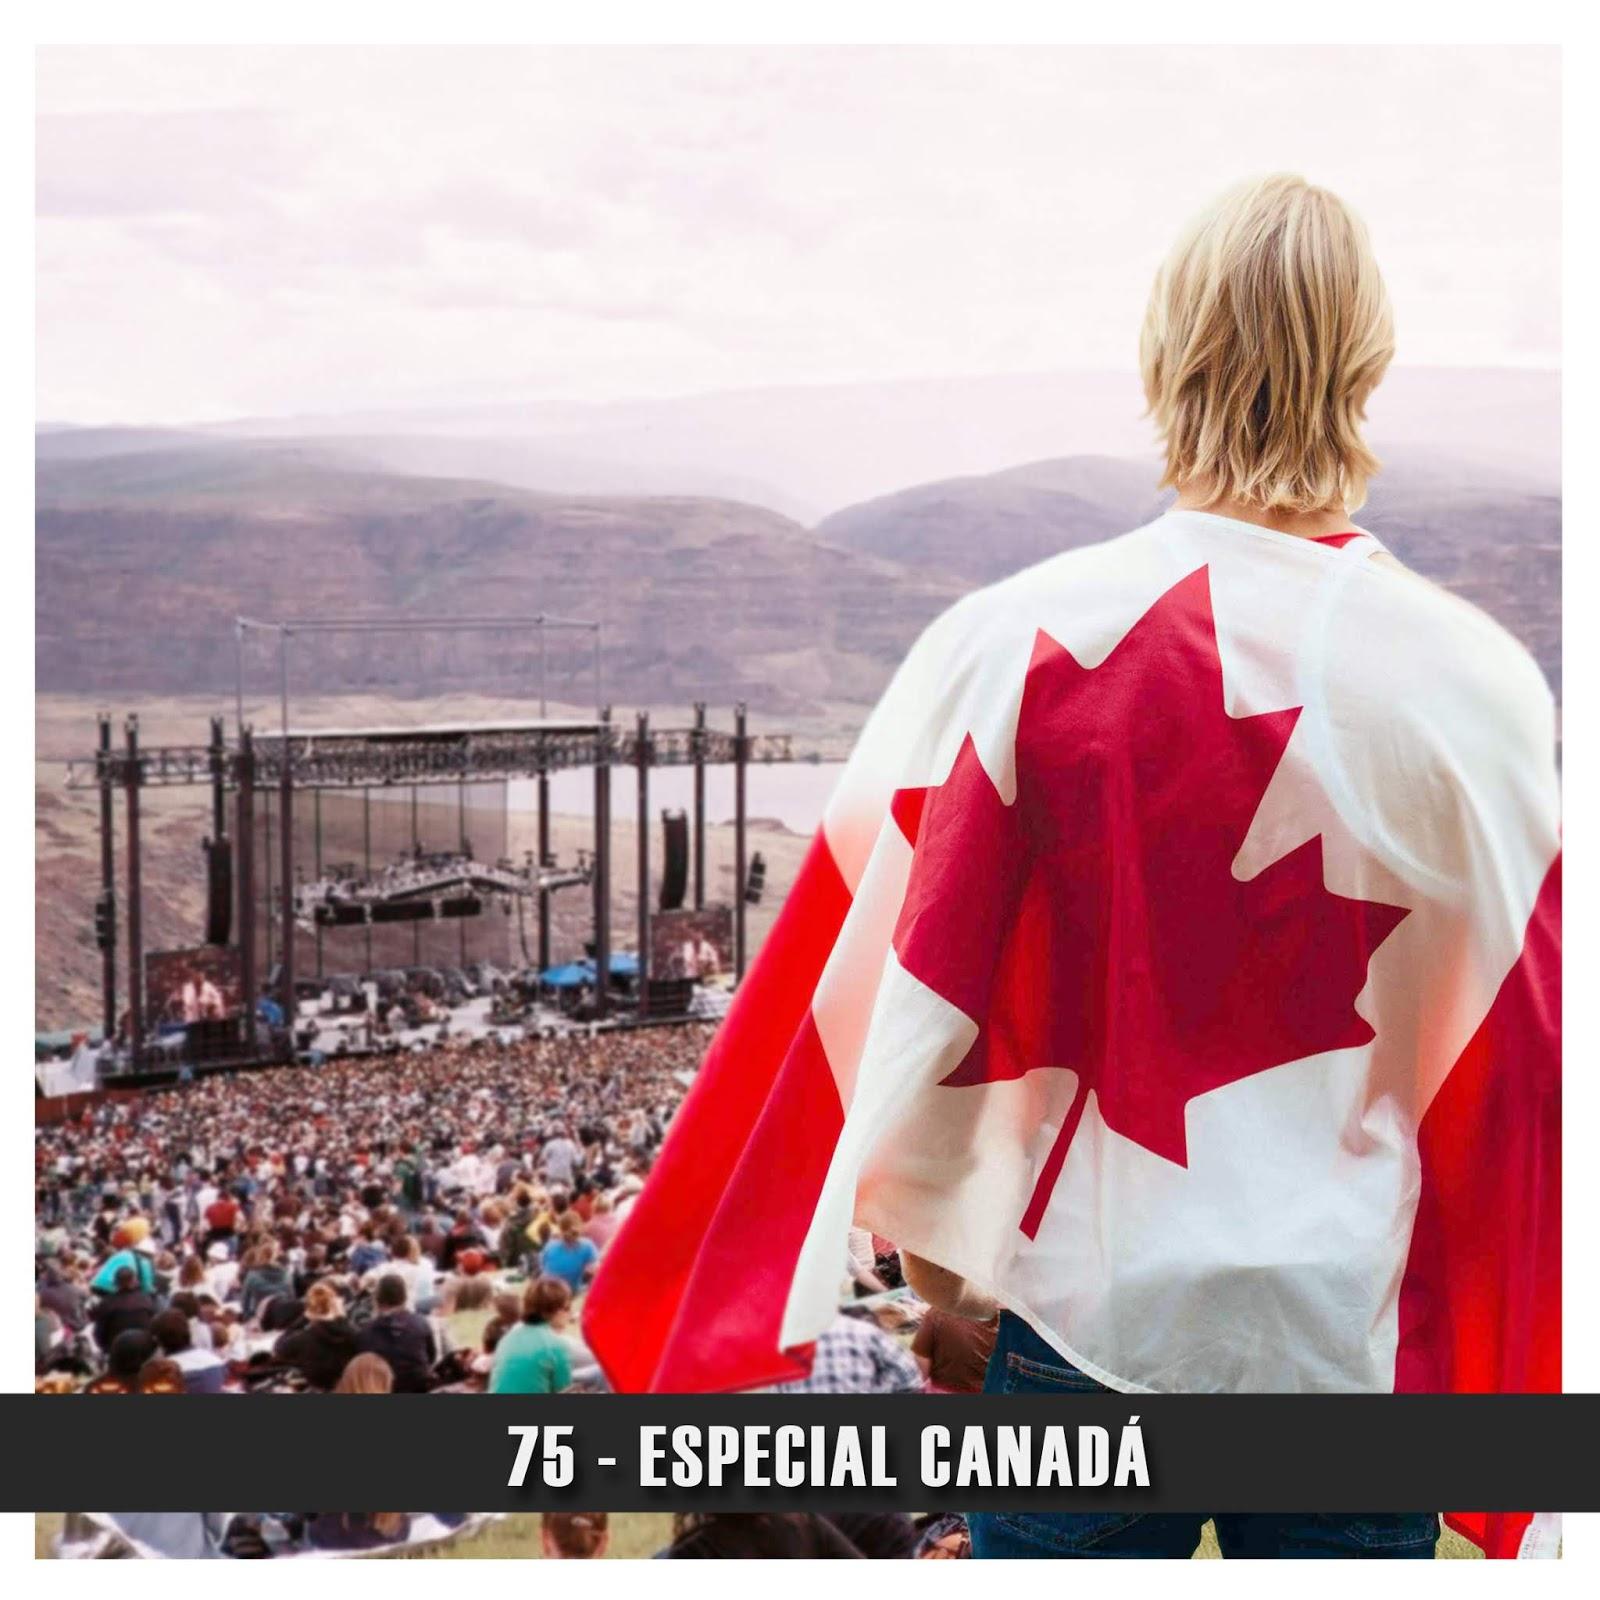 Doublecast 75 - Especial Canadá